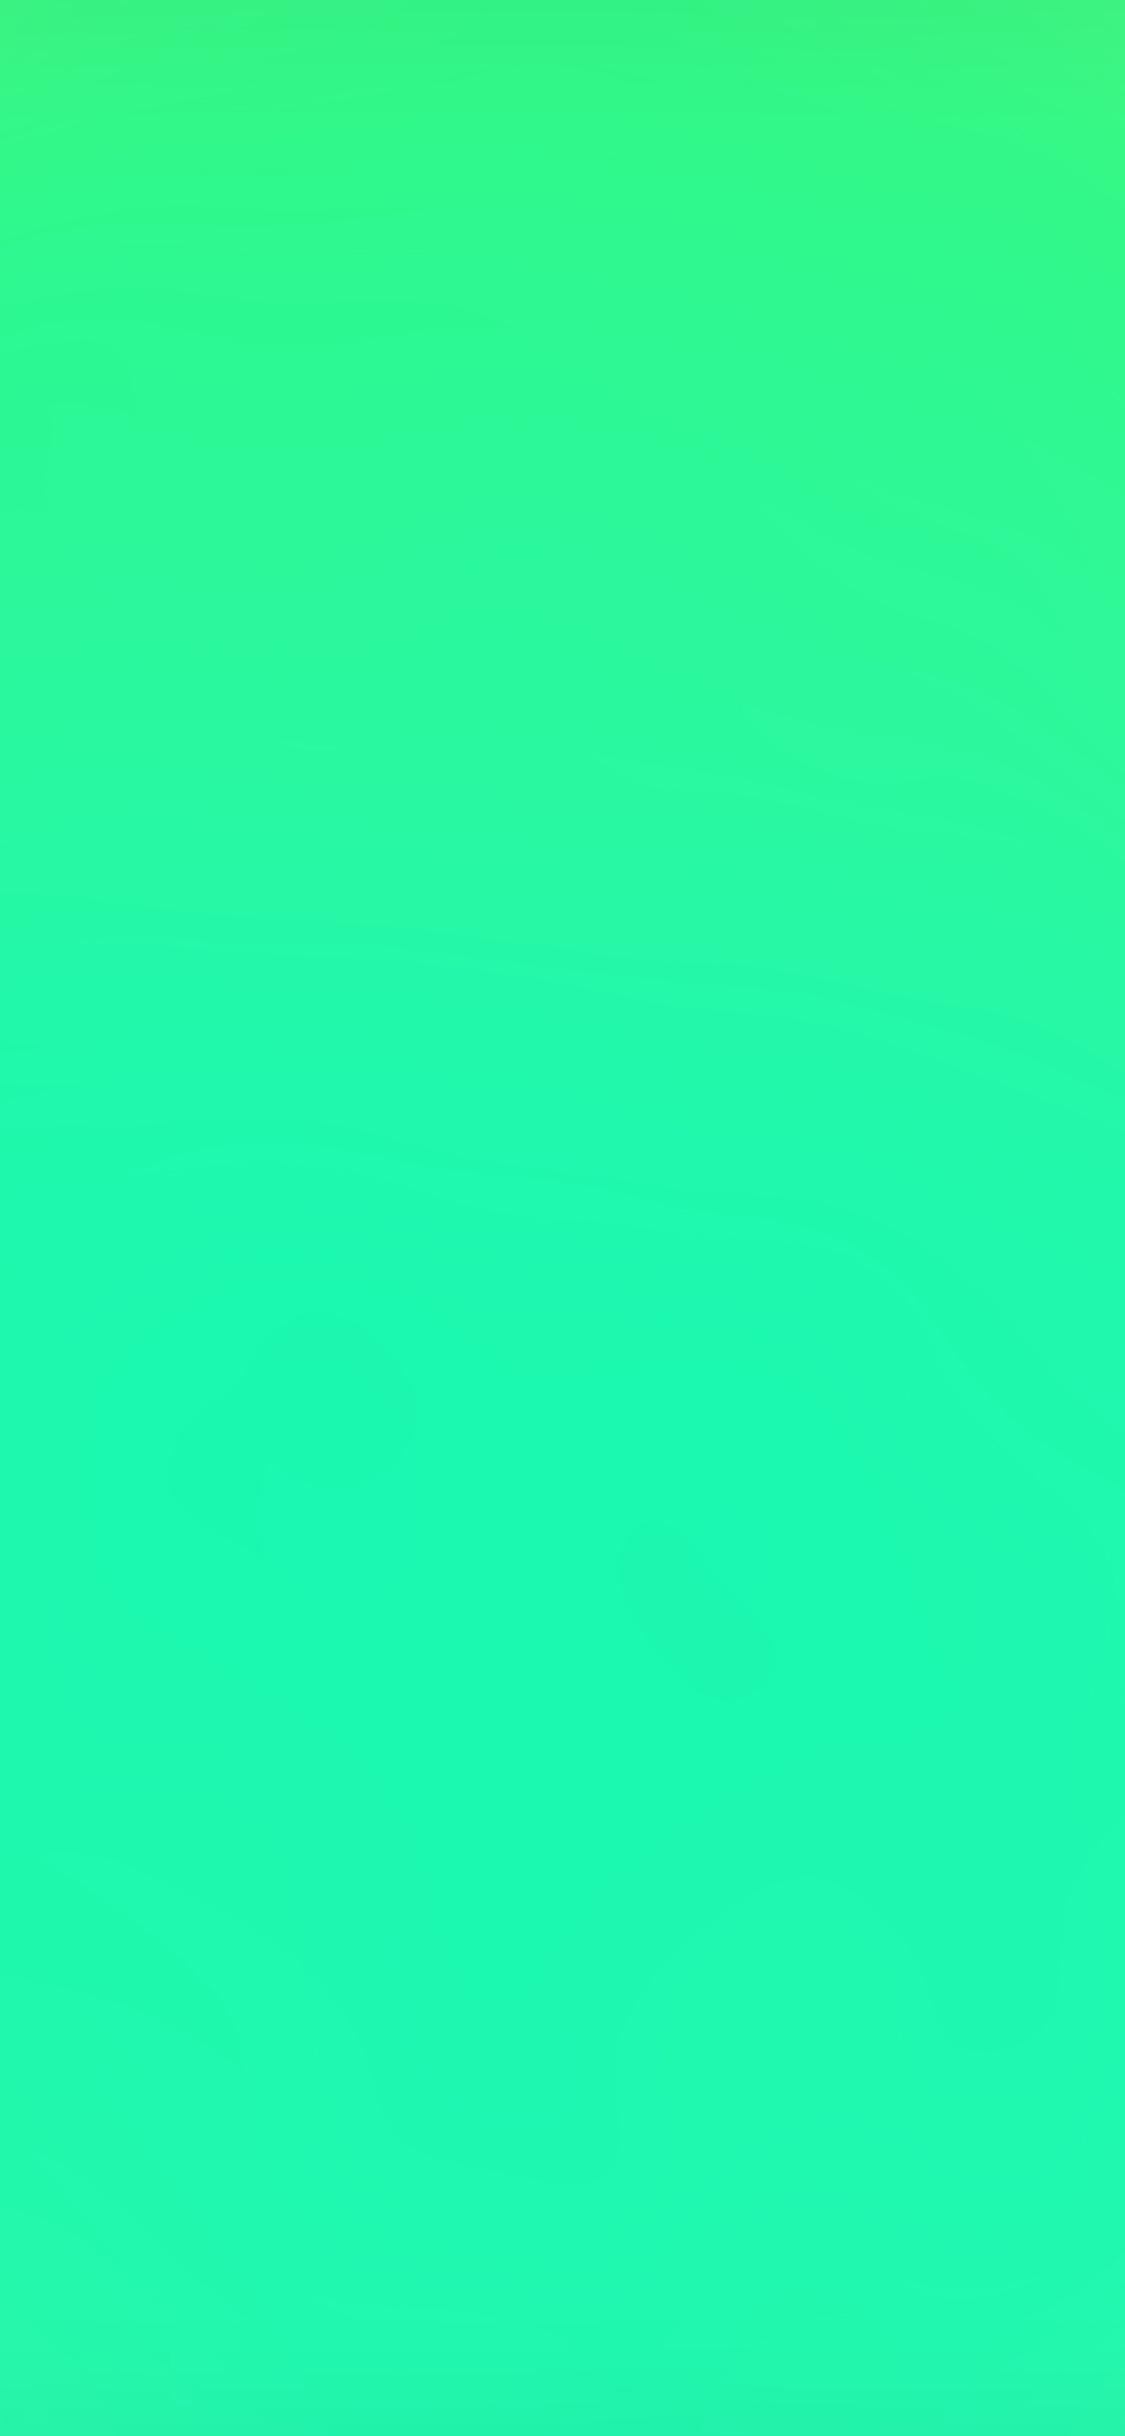 Iphonexpapers Com Iphone X Wallpaper Sk21 Green Light Pastel Blur Gradation